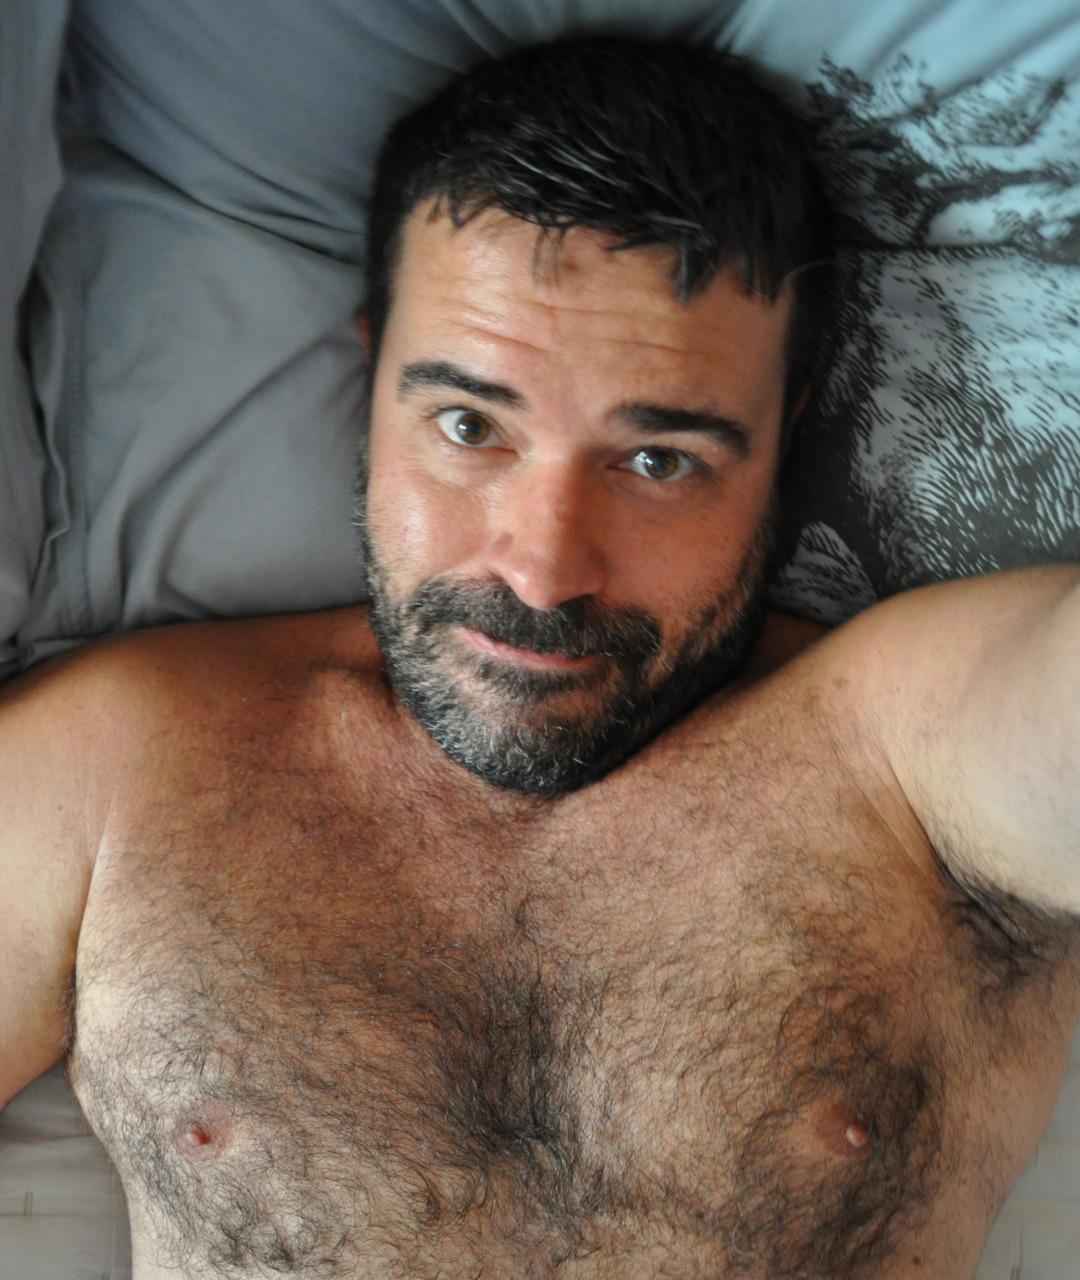 2018-06-04 05:23:08 - barebearx please follow me over beardburnme http://www.neofic.com